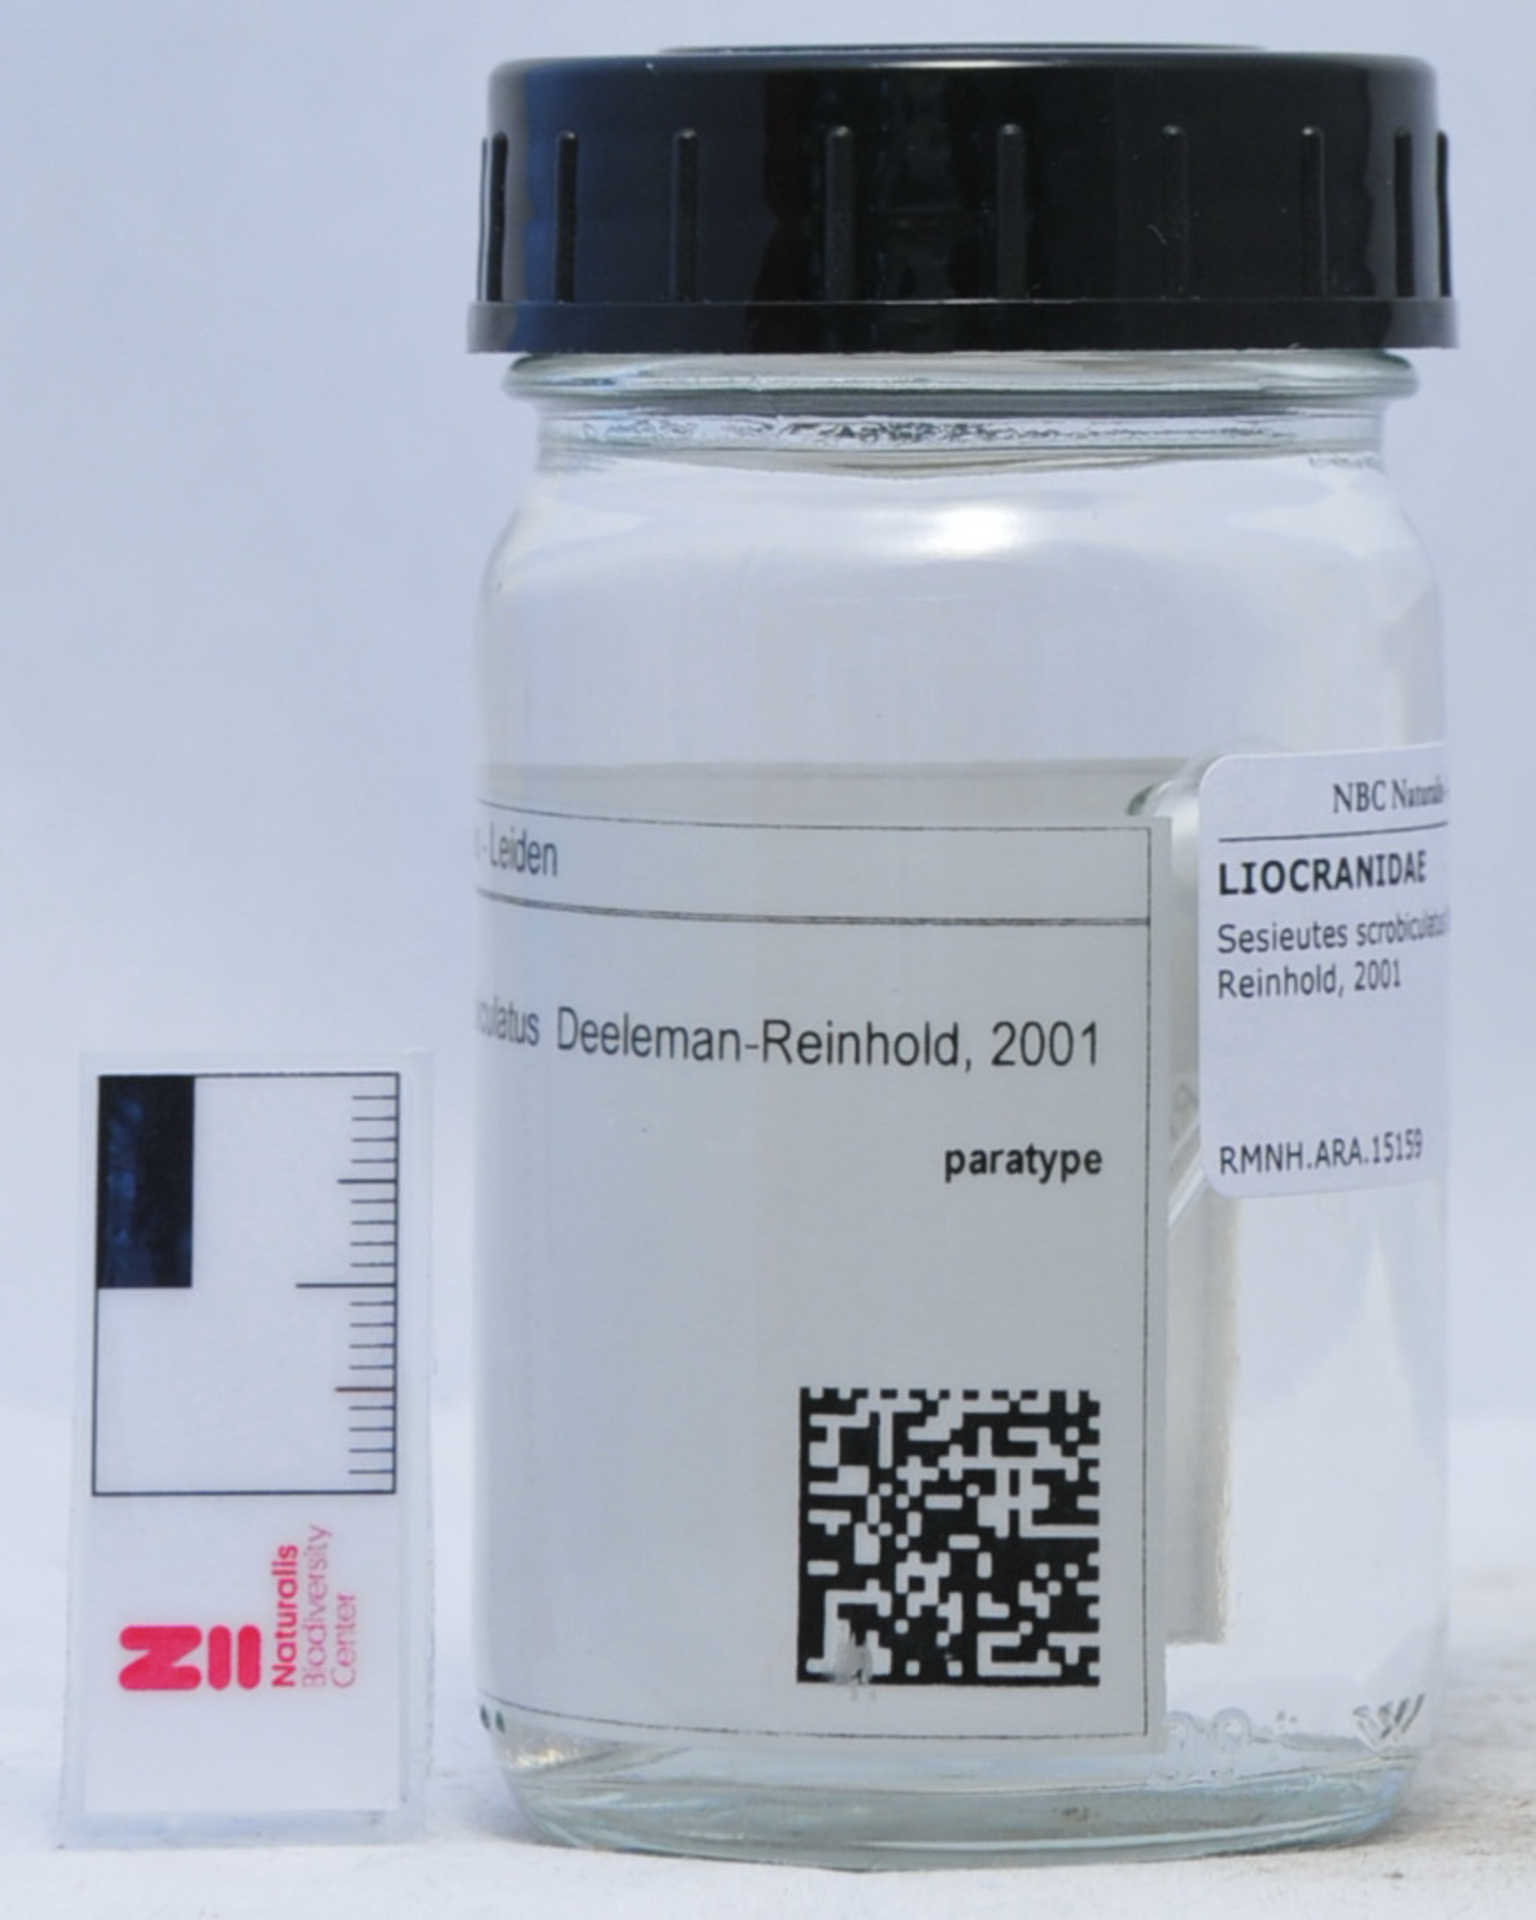 RMNH.ARA.15159 | Sesieutes scrobiculatus Deeleman-Reinhold, 2001